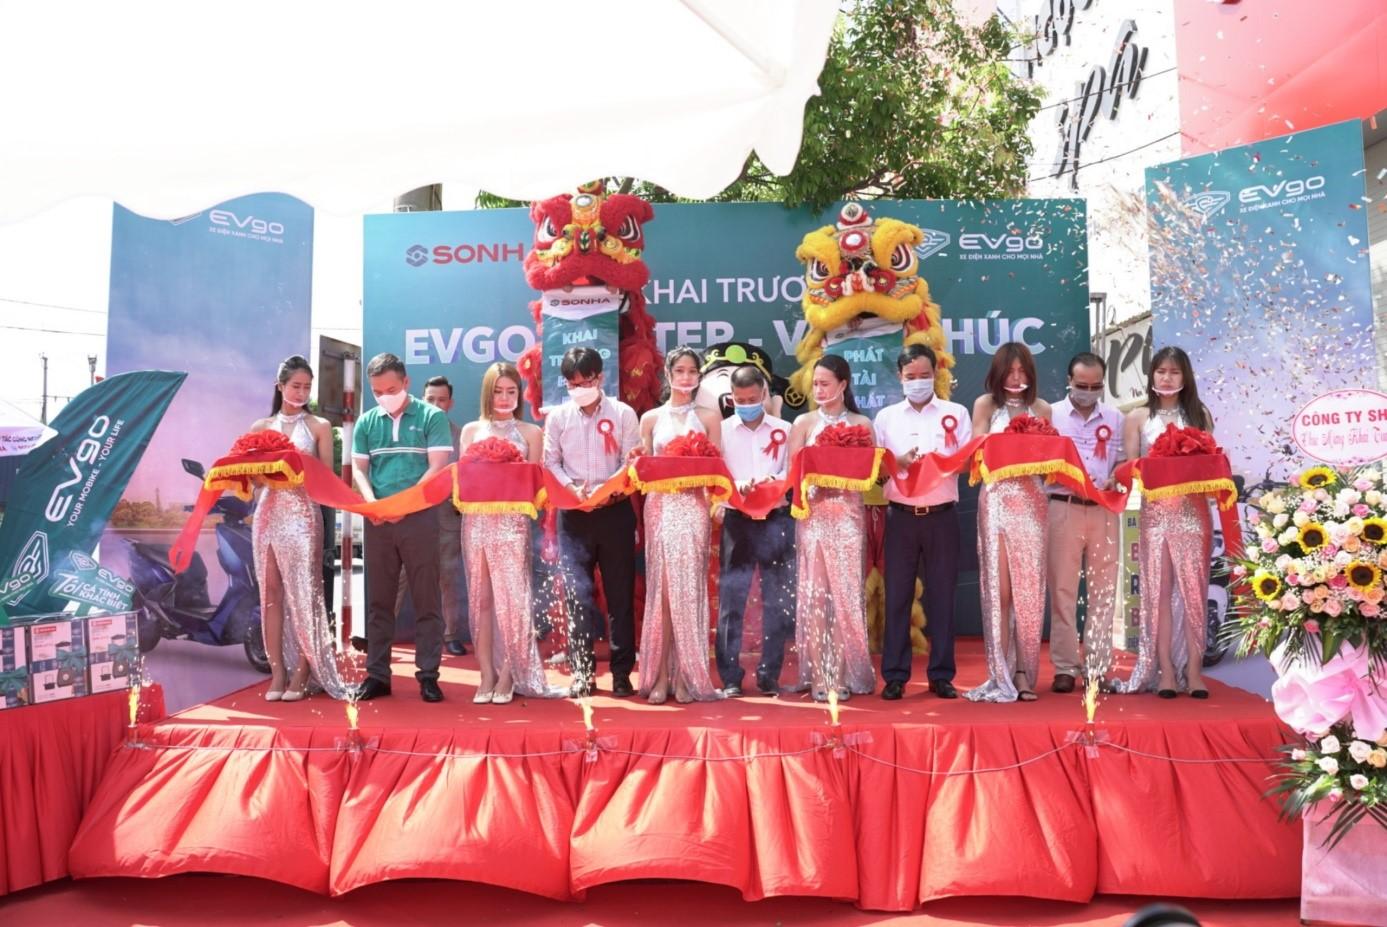 Cắt băng khai trương EVgo Center Vĩnh Phúc.